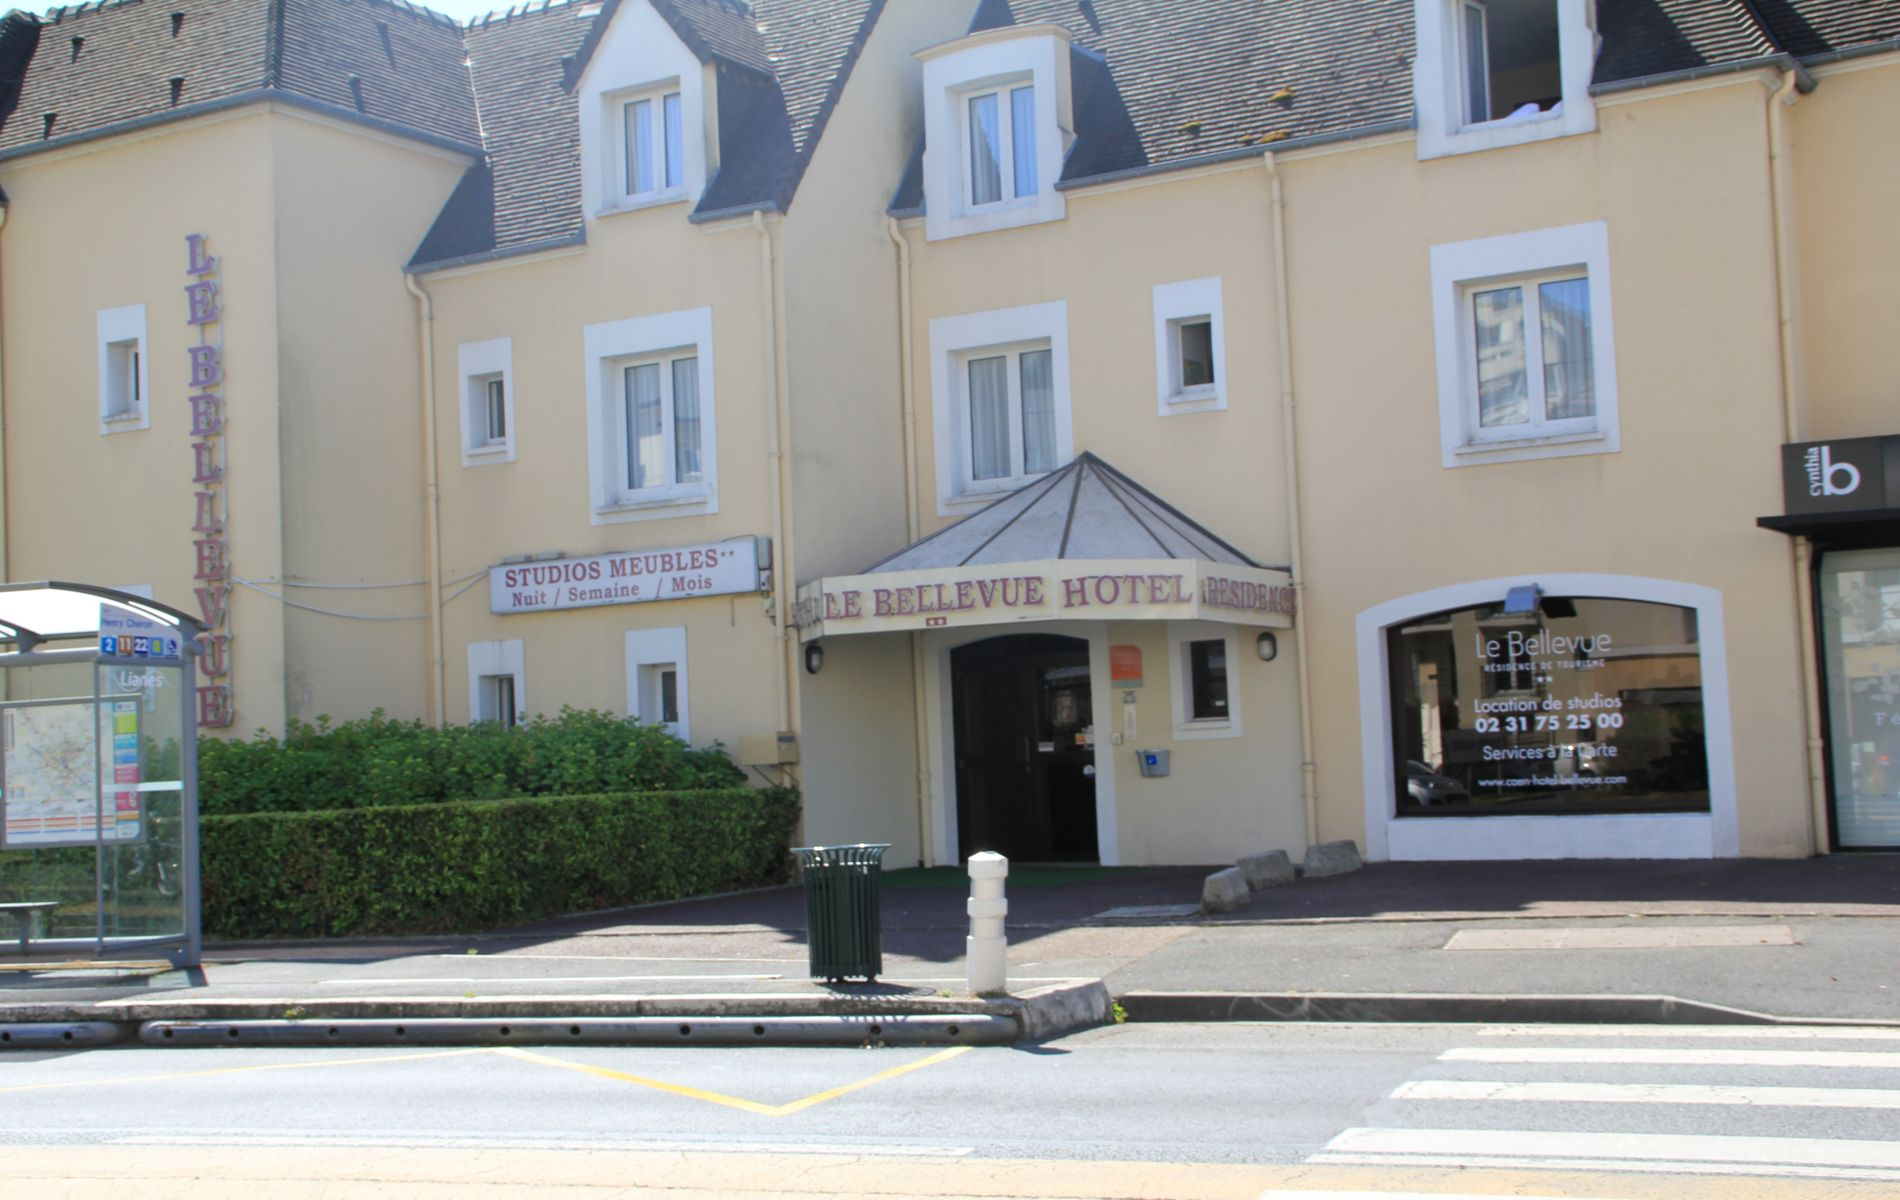 Appart Hotel Le Bellevue Caen - Hotel à Caen